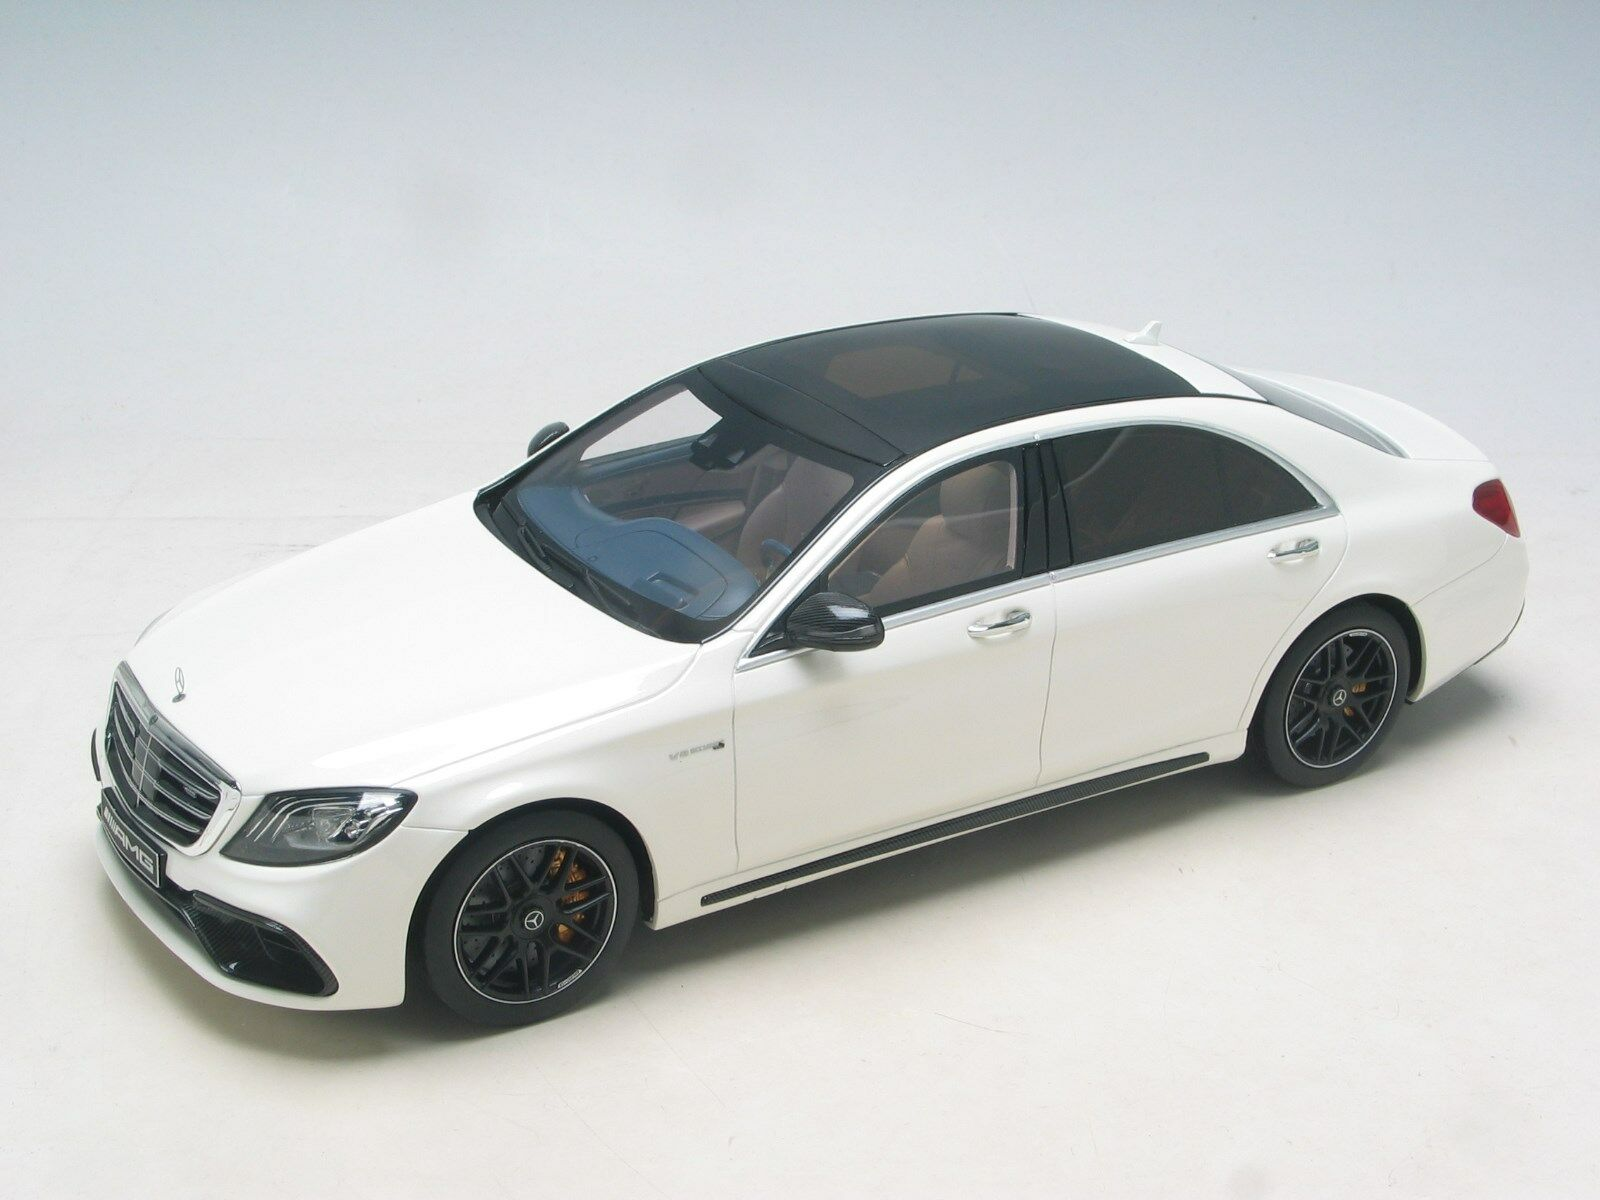 grandes ofertas 1 18 Mercedes-Benz AMG S 63 MOPF Lang Diamante blancoo blancoo blancoo (GT-espíritu) D.V  hermoso